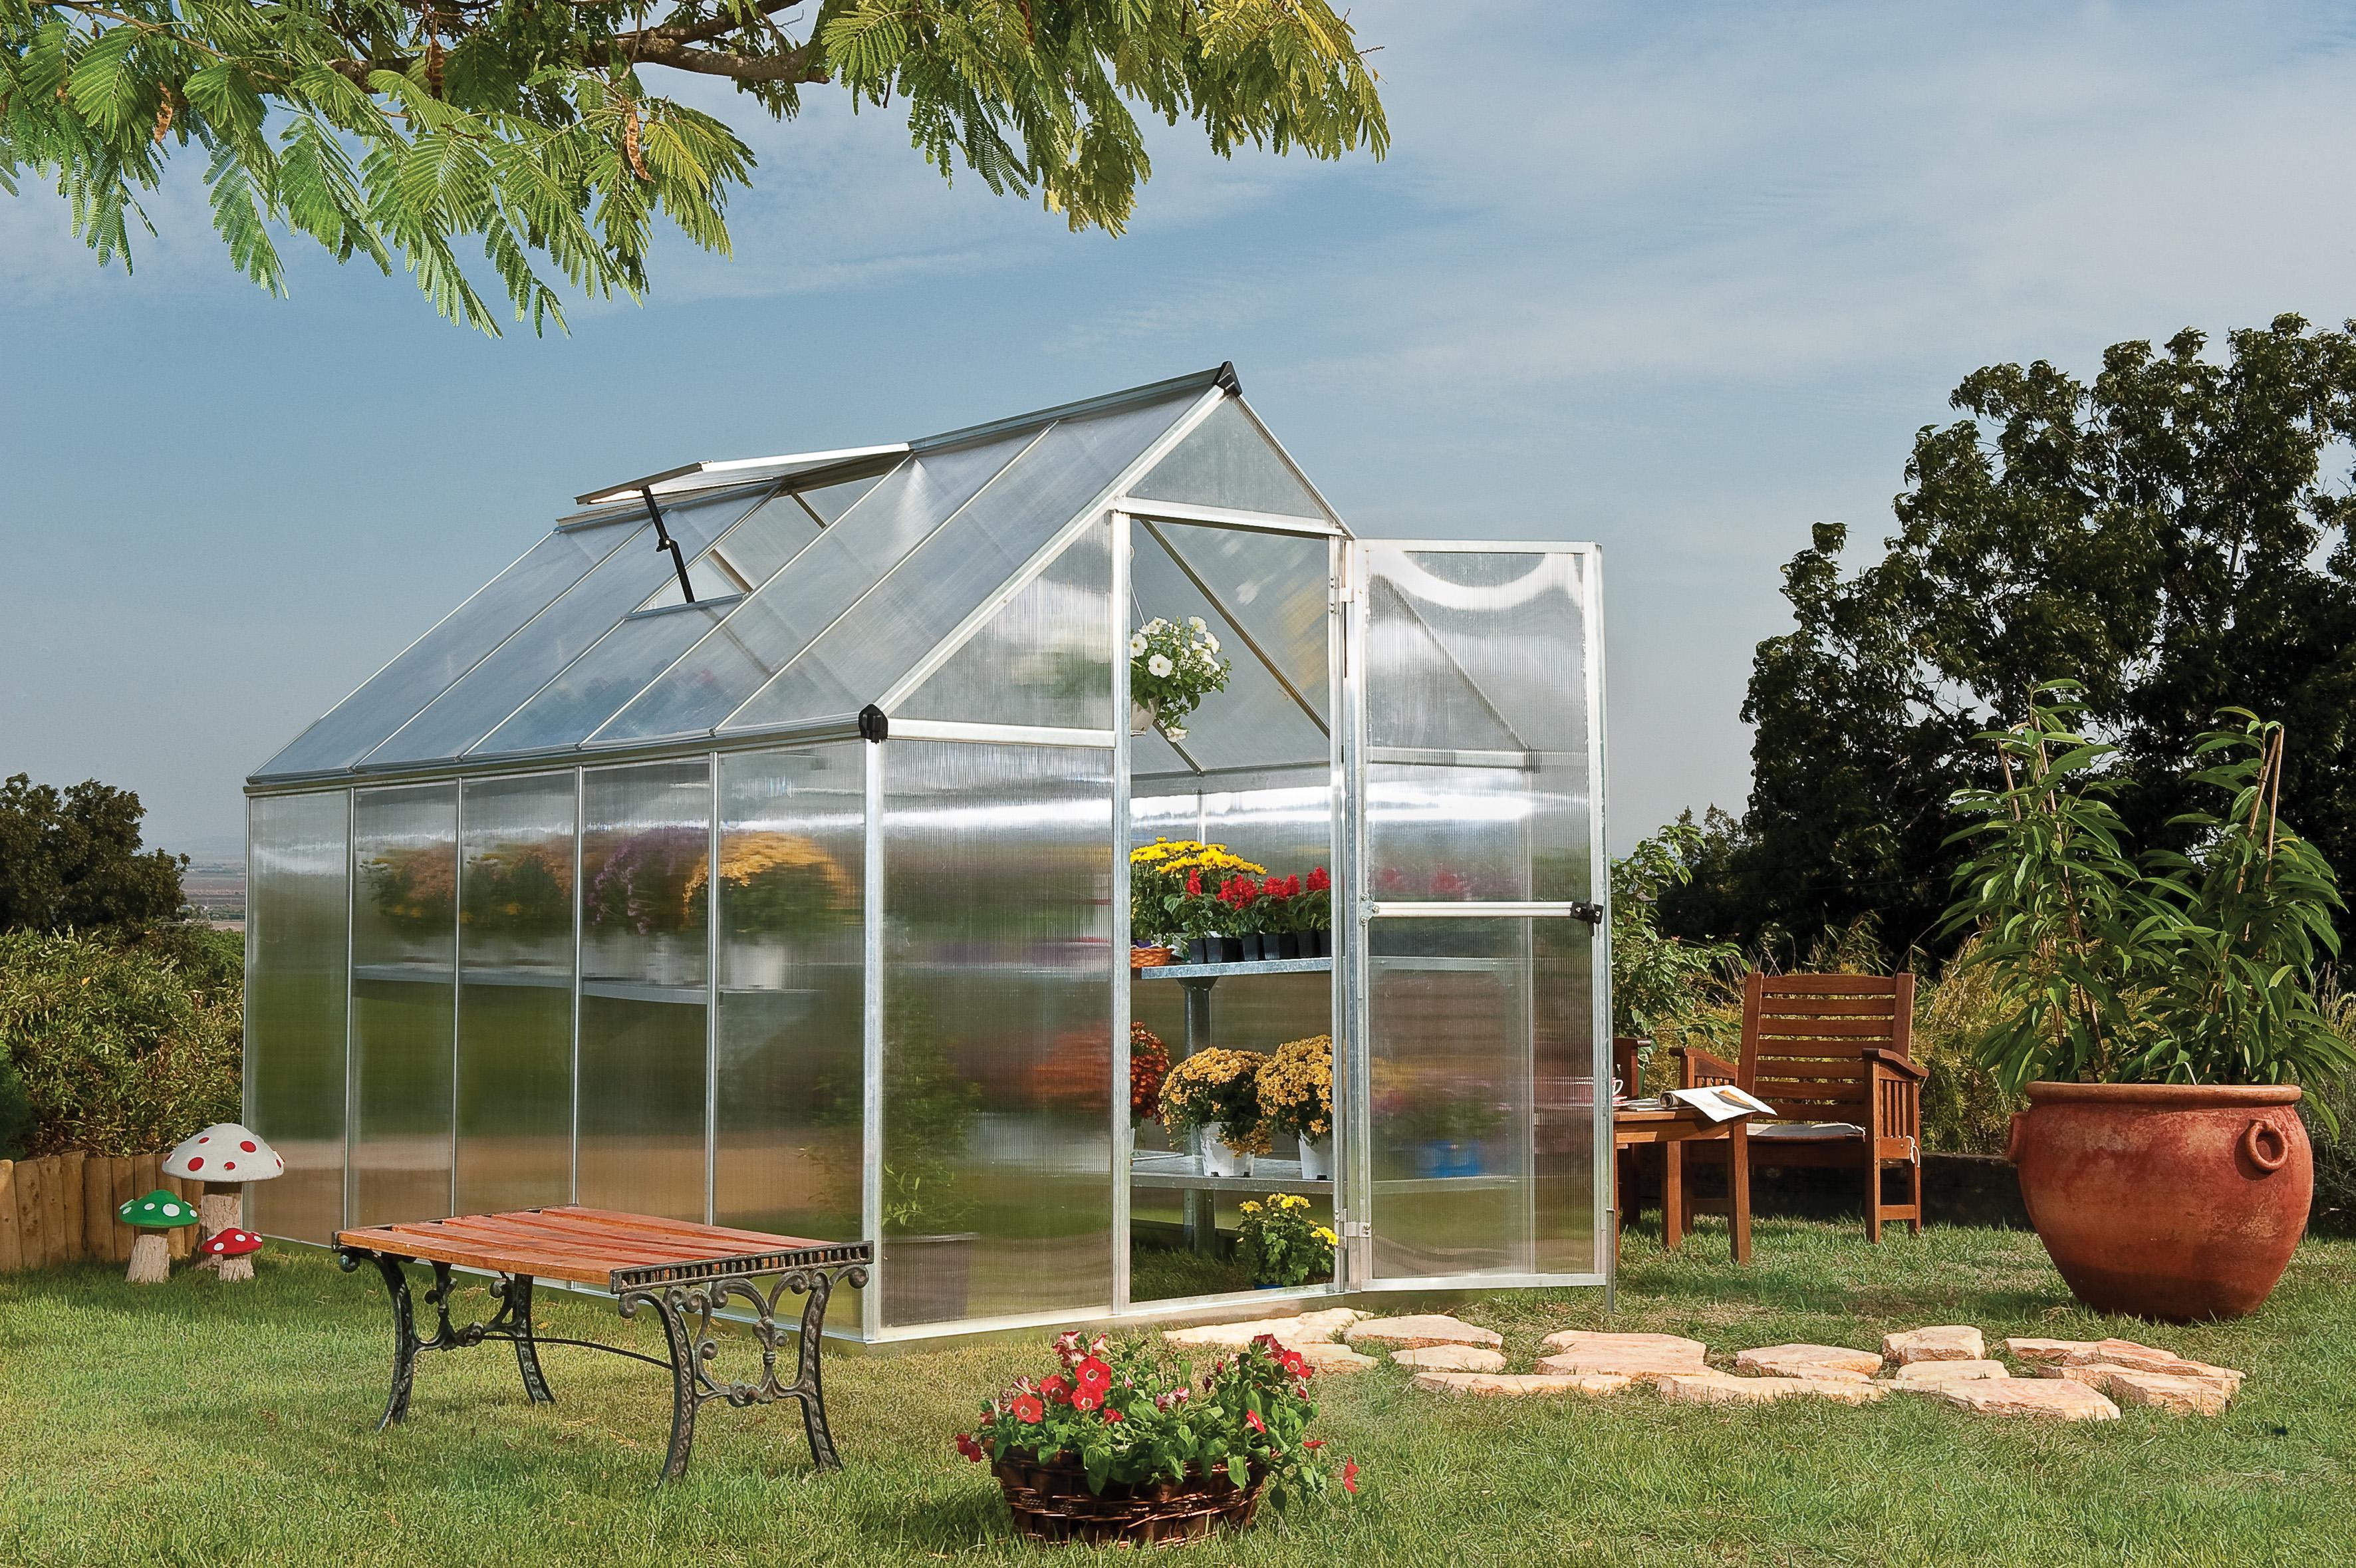 polykarbonátový skleník Palram multiline 6x10 + ZDARMA základna skleníku + ZDARMA automatický otvírač oken + hnojivo Biocin-FF + prodloužená ZÁRUKA 10 LET